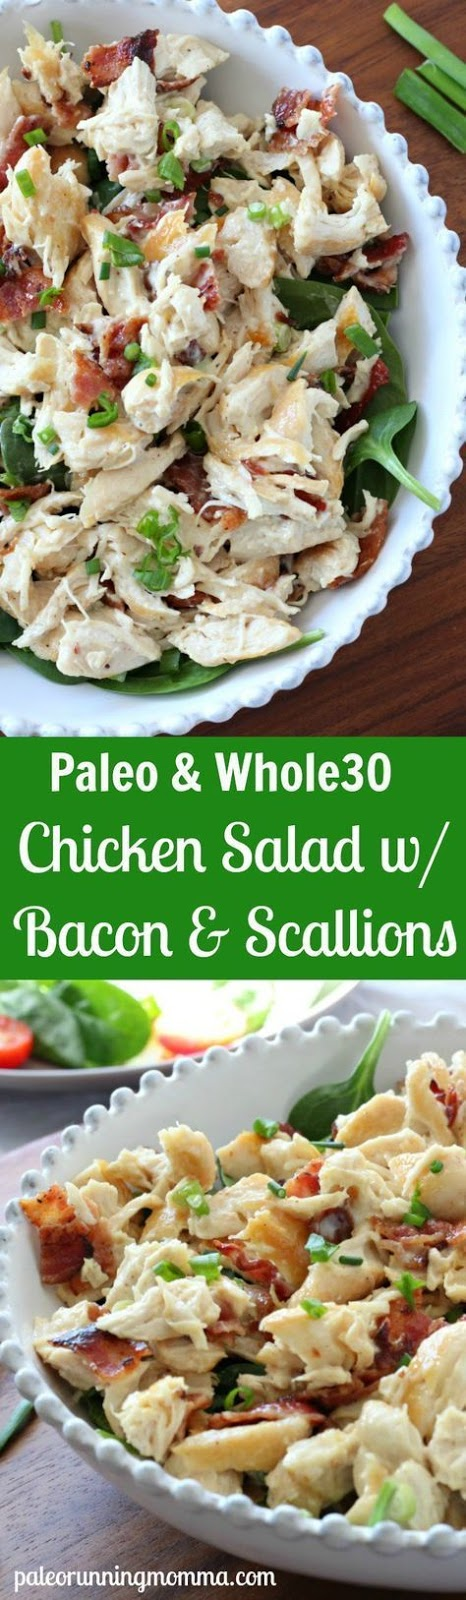 Bacon Scallion Chicken Salad